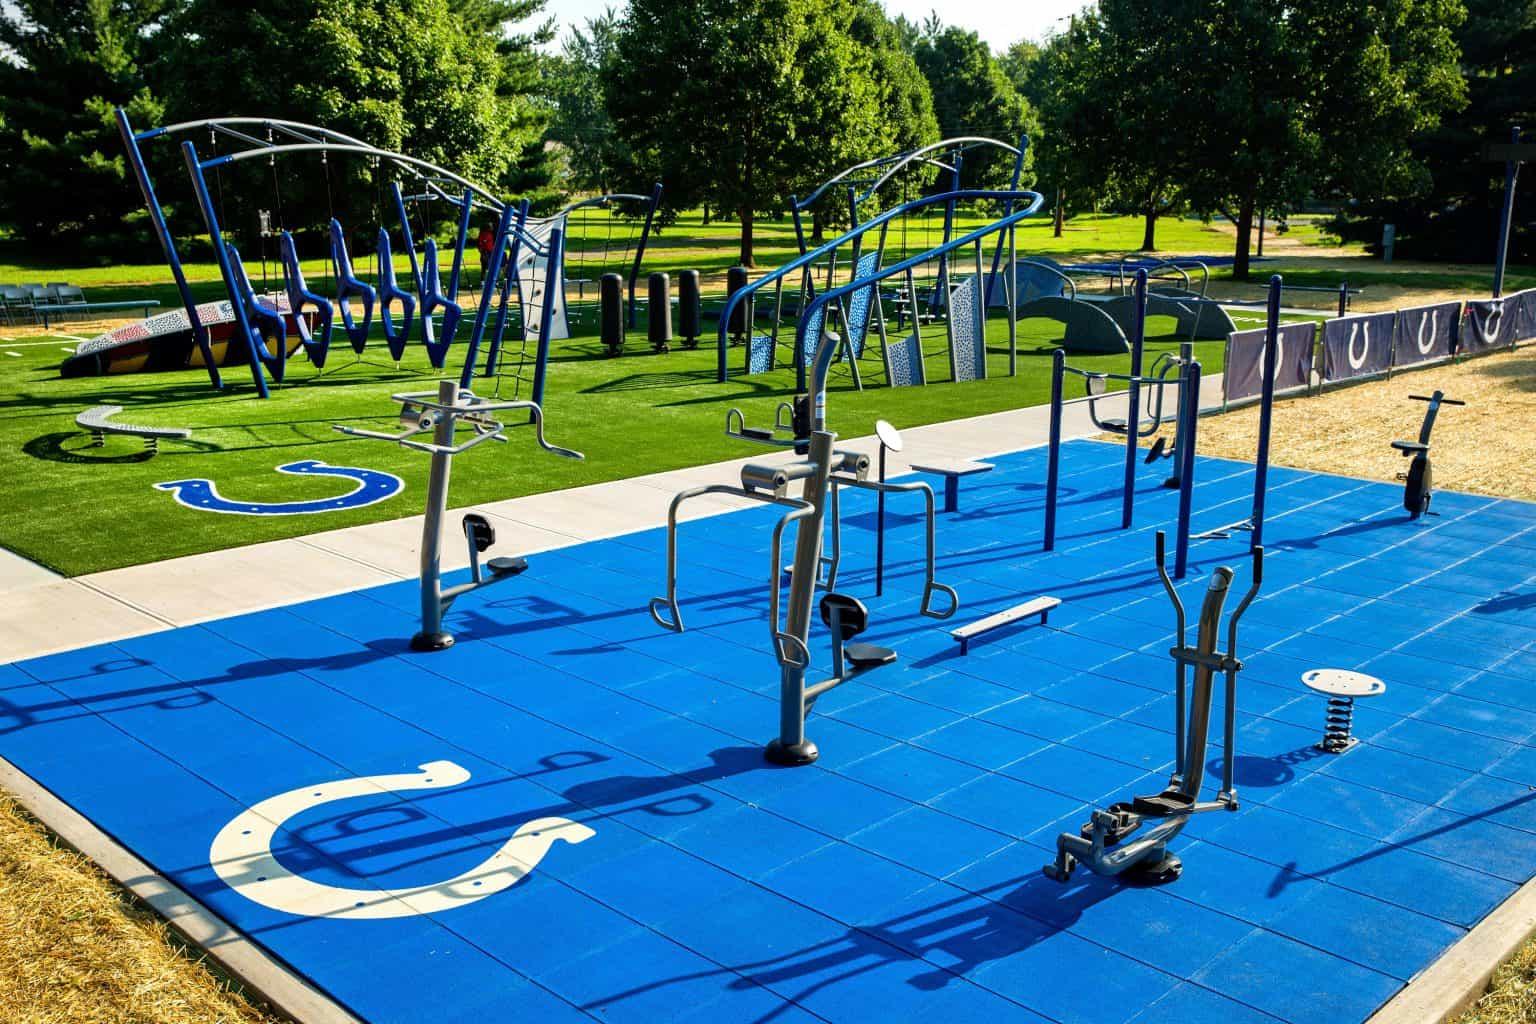 outdoor-fitness-equipment_49644071997_o-1536x1024